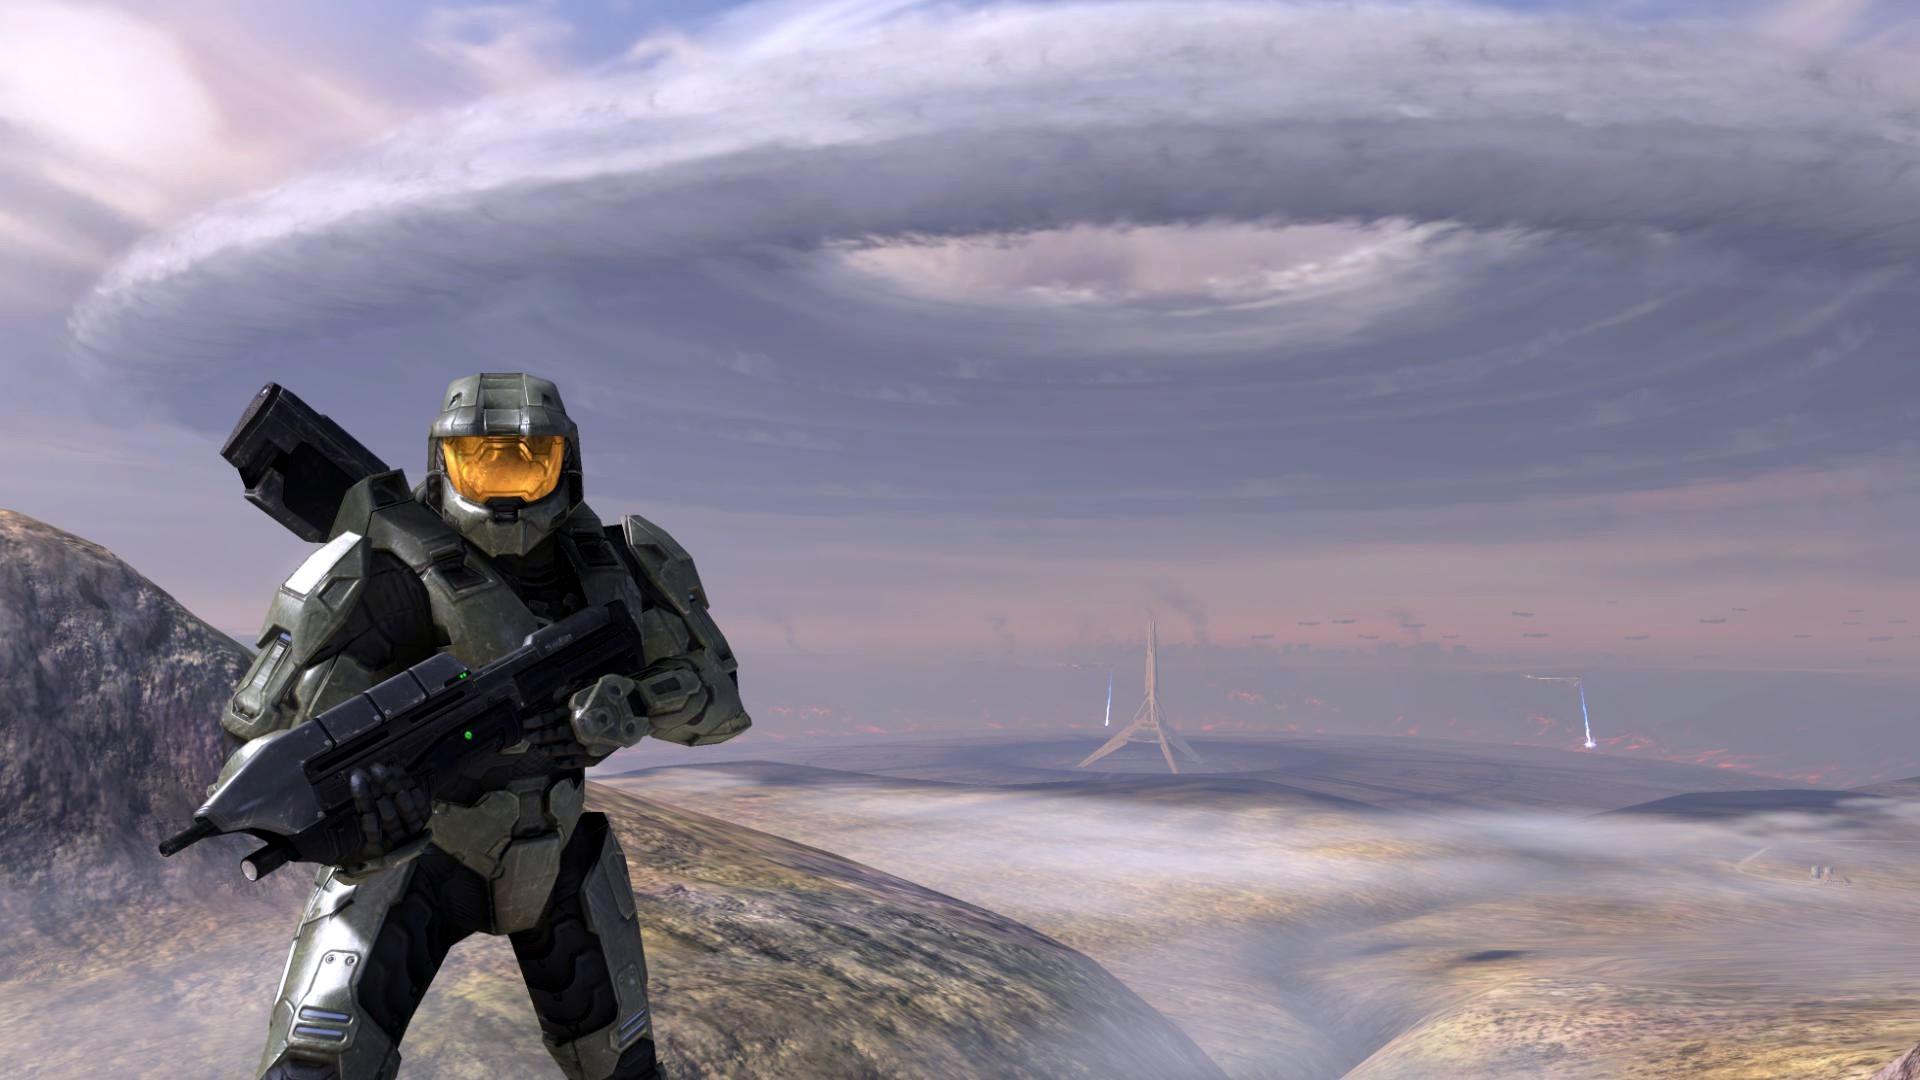 Halo Reach Desktop Wallpaper